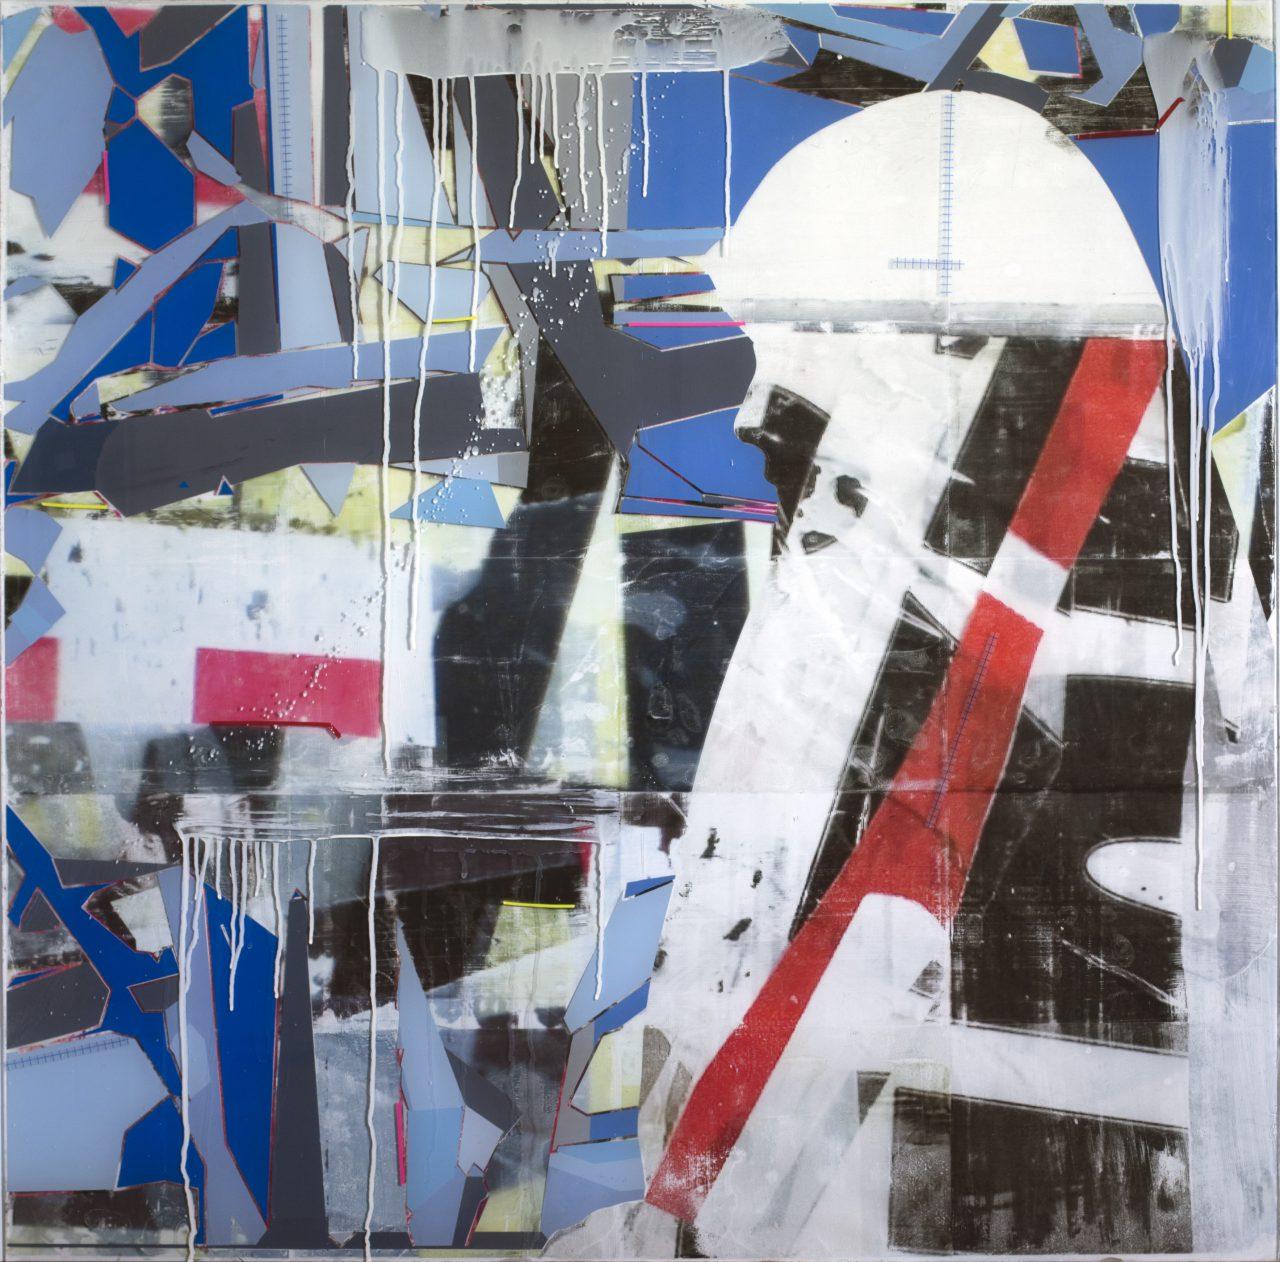 Dangerous minds #2, 112cm x 112cm x 0,6cm / Acrylic paint, image transfer, vinyl, self adhessive tape on transparent acrylic glass.